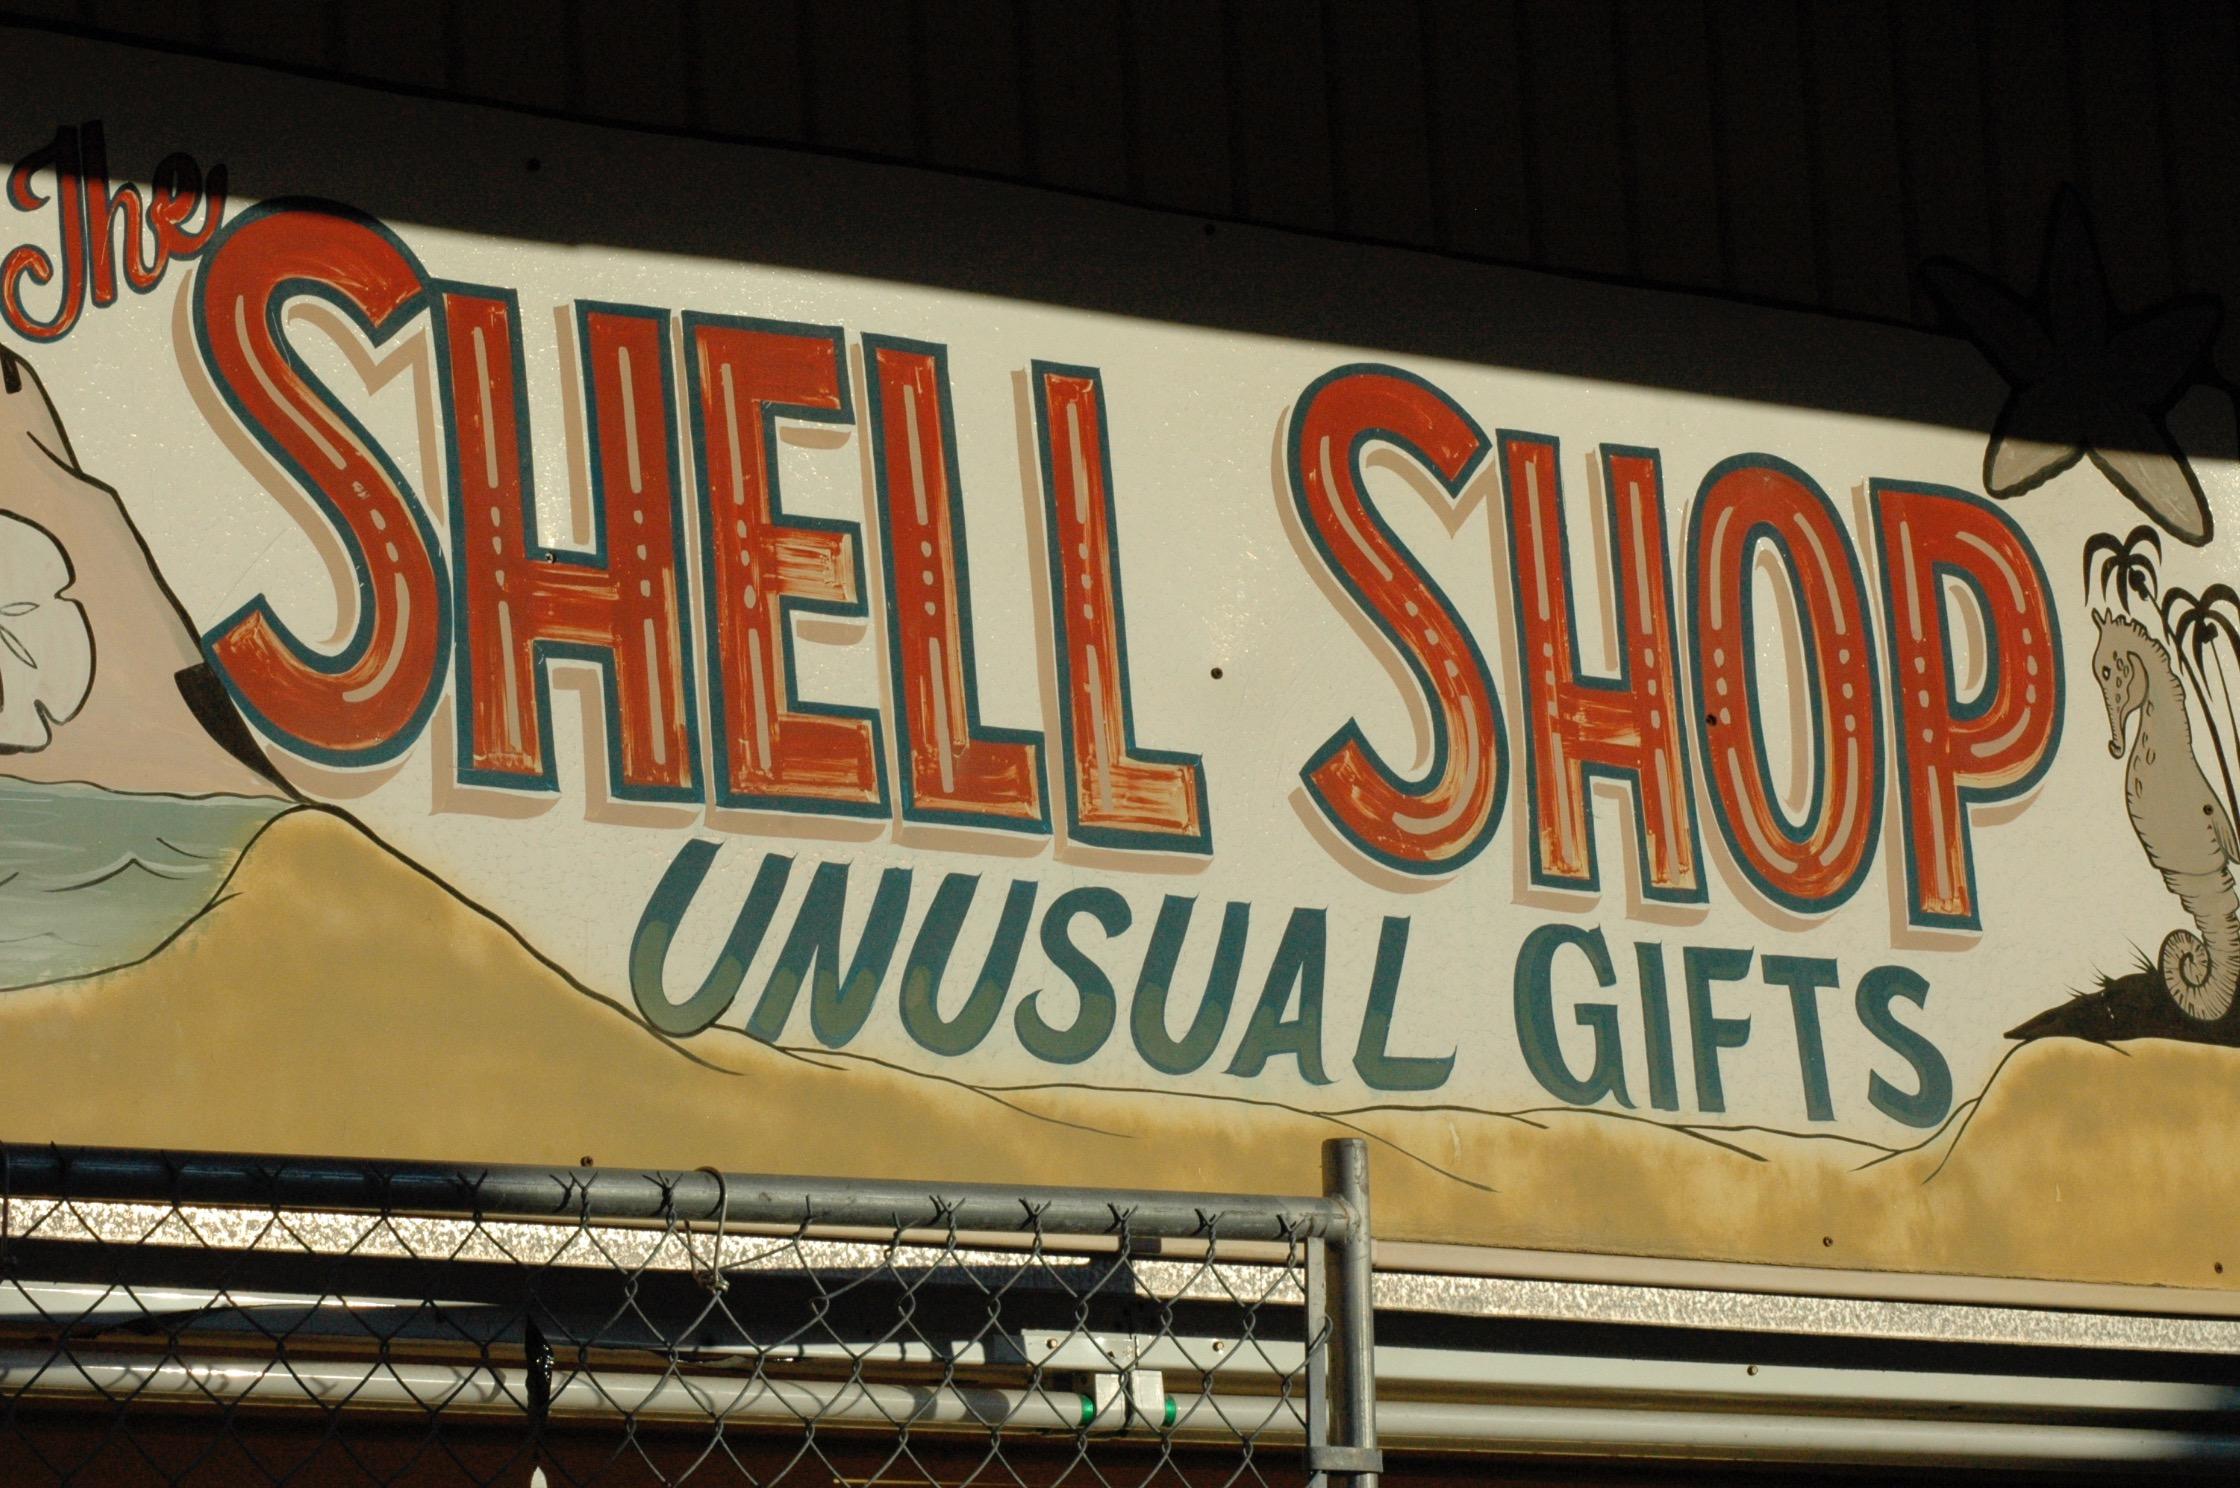 Shell Shop.jpg